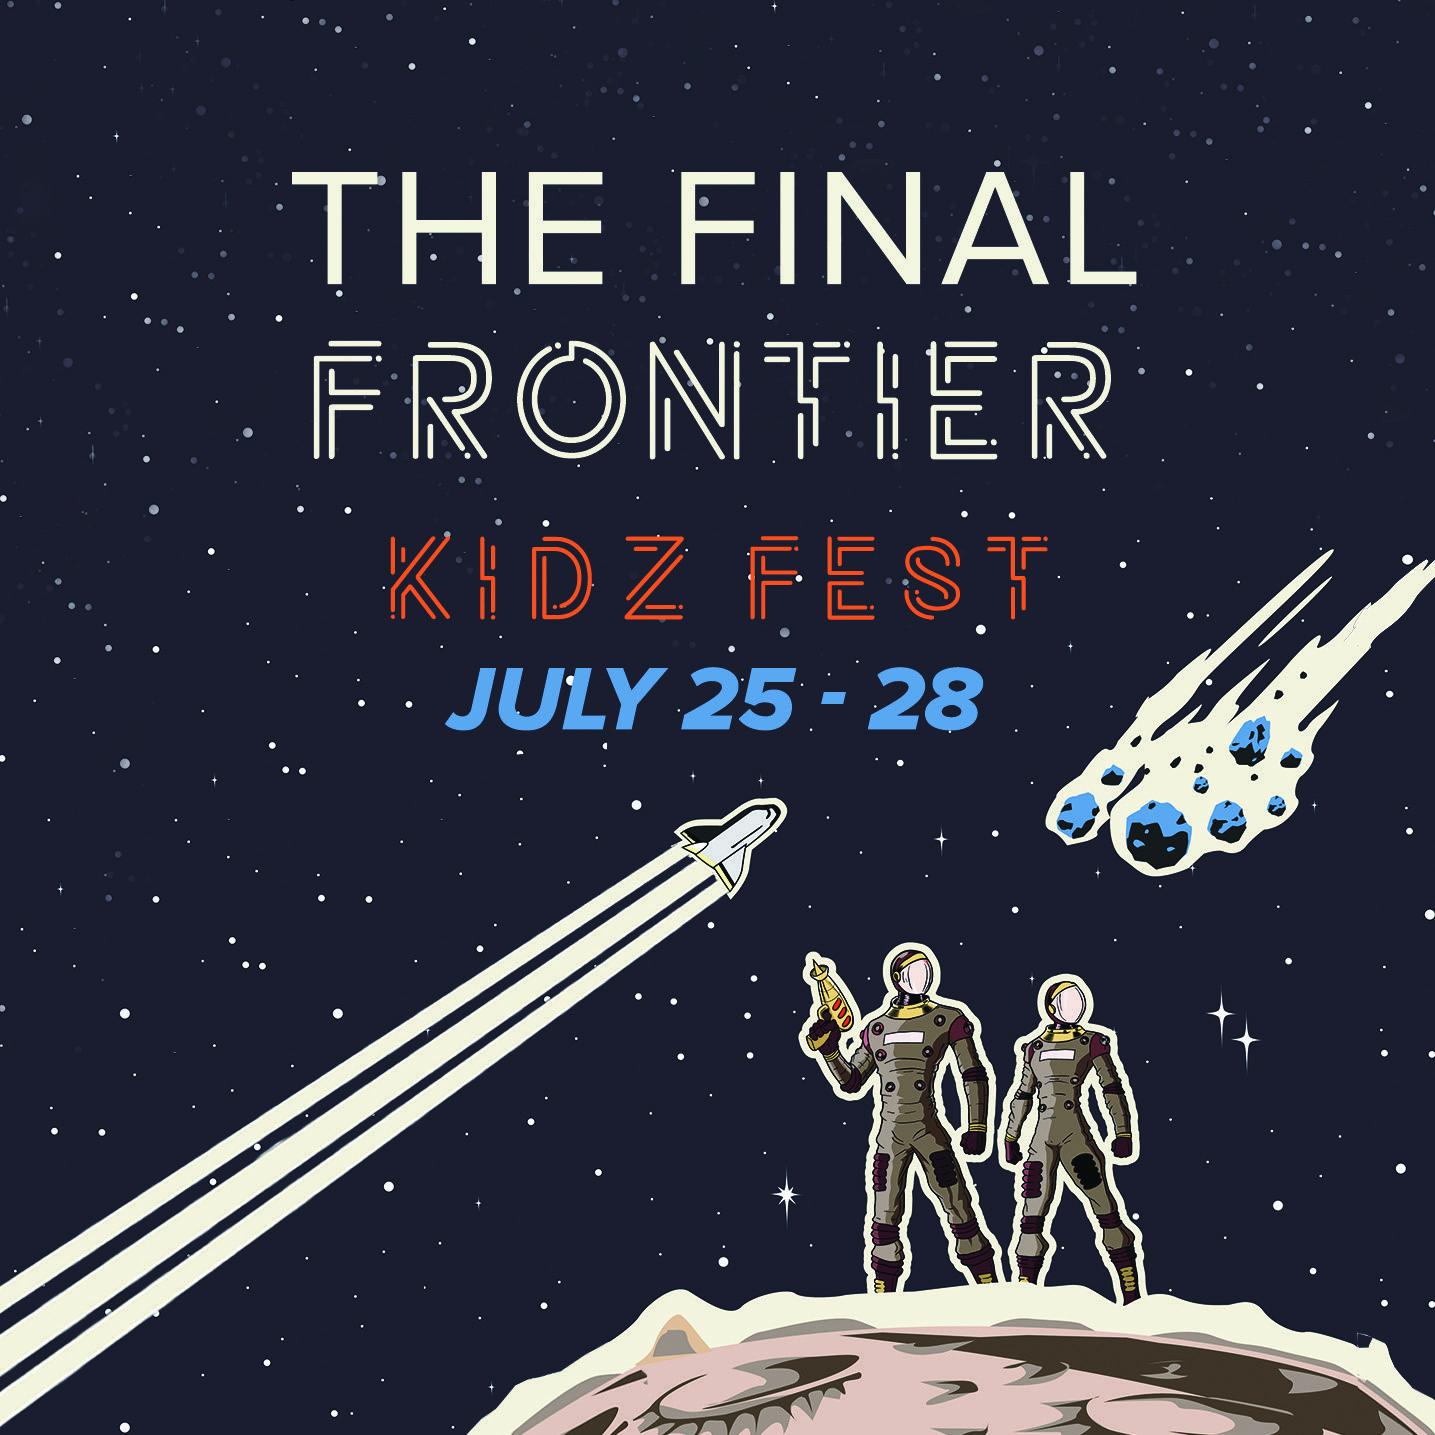 Kidsfest-front-2019.jpeg